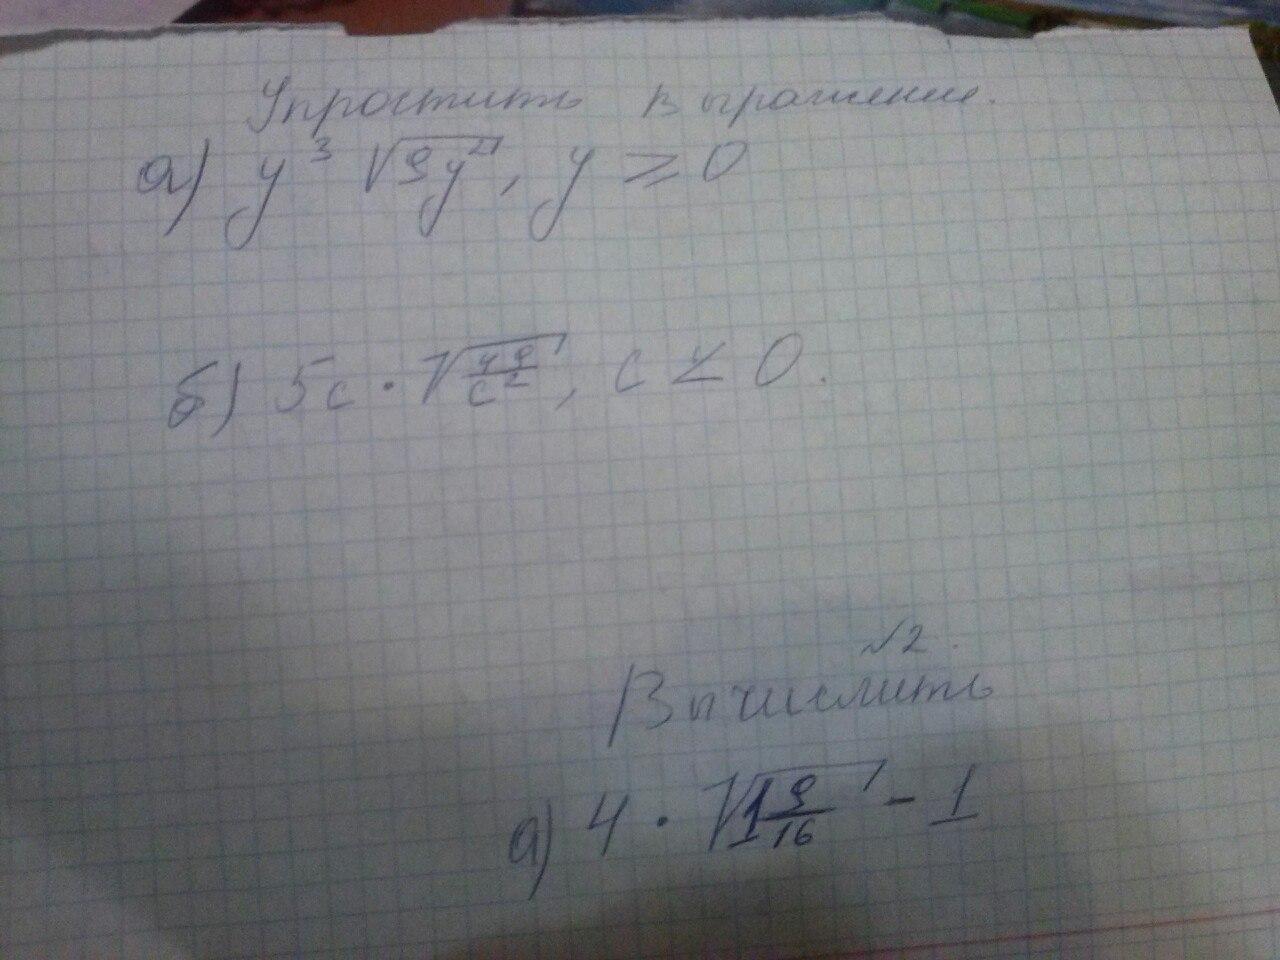 Vduvateli ru